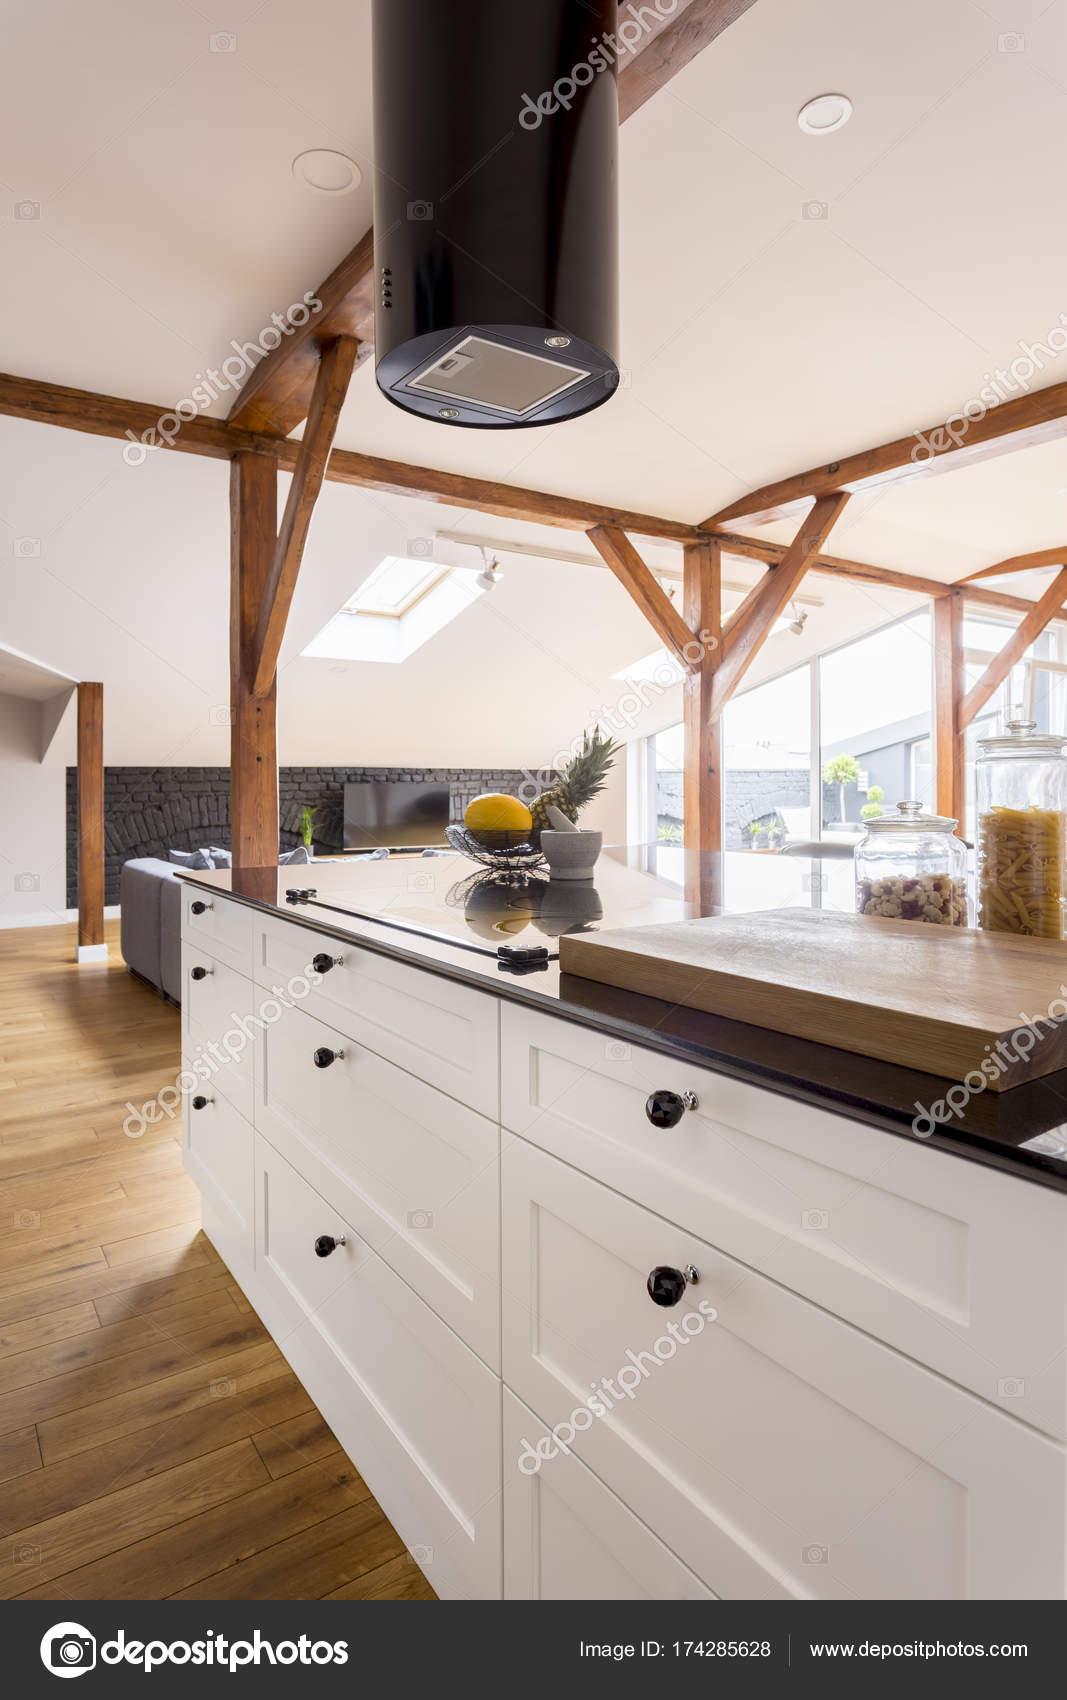 Cocina con muebles blancos — Fotos de Stock © photographee.eu #174285628